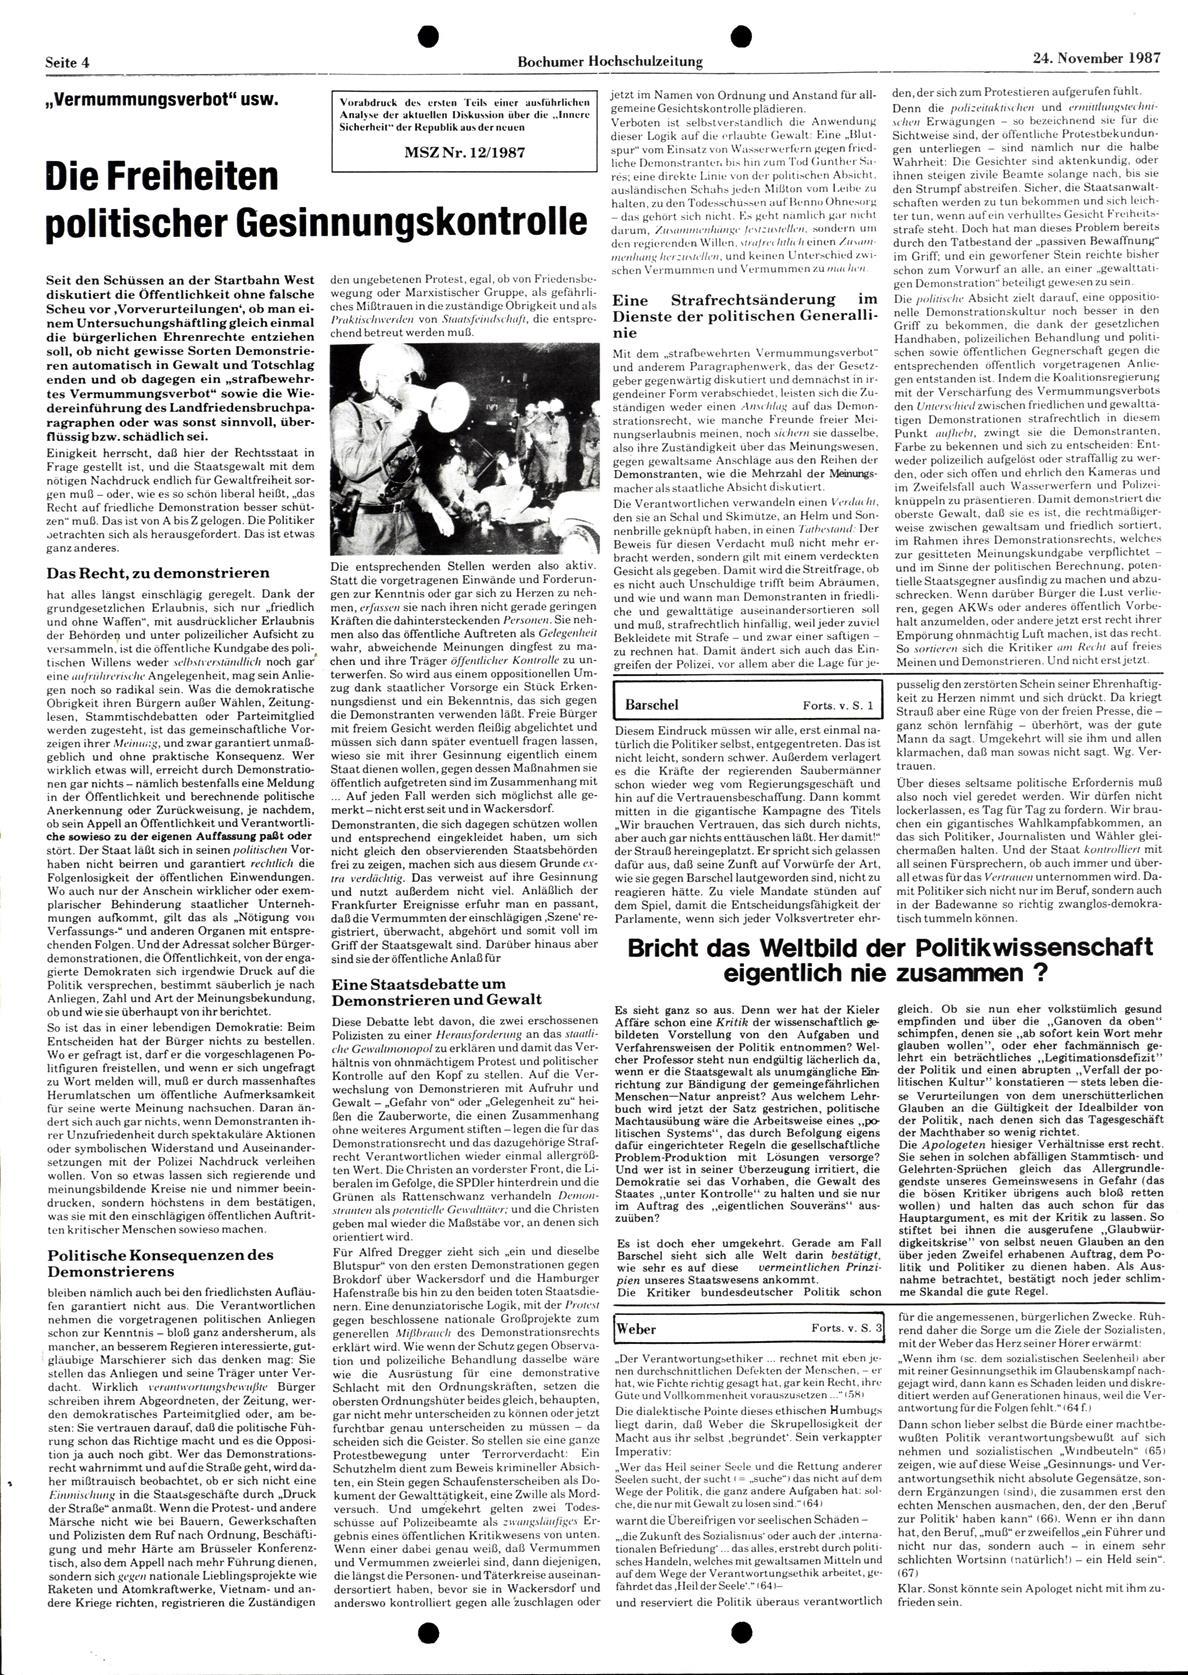 Bochum_BHZ_19871124_160_004